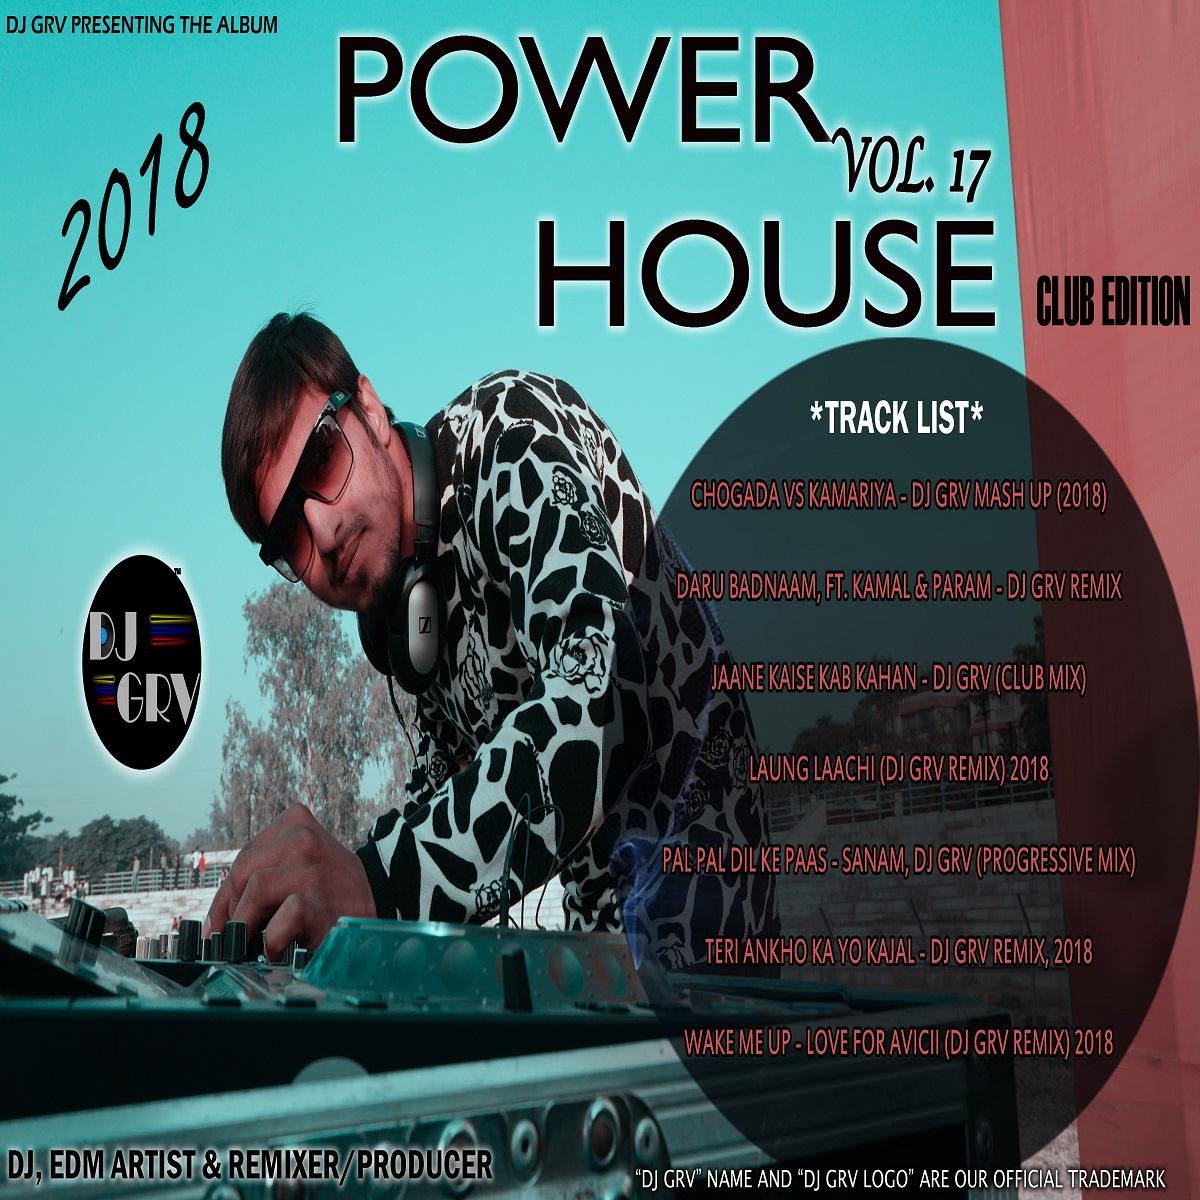 Daru Badnaam Song 2018: Power House Vol.17